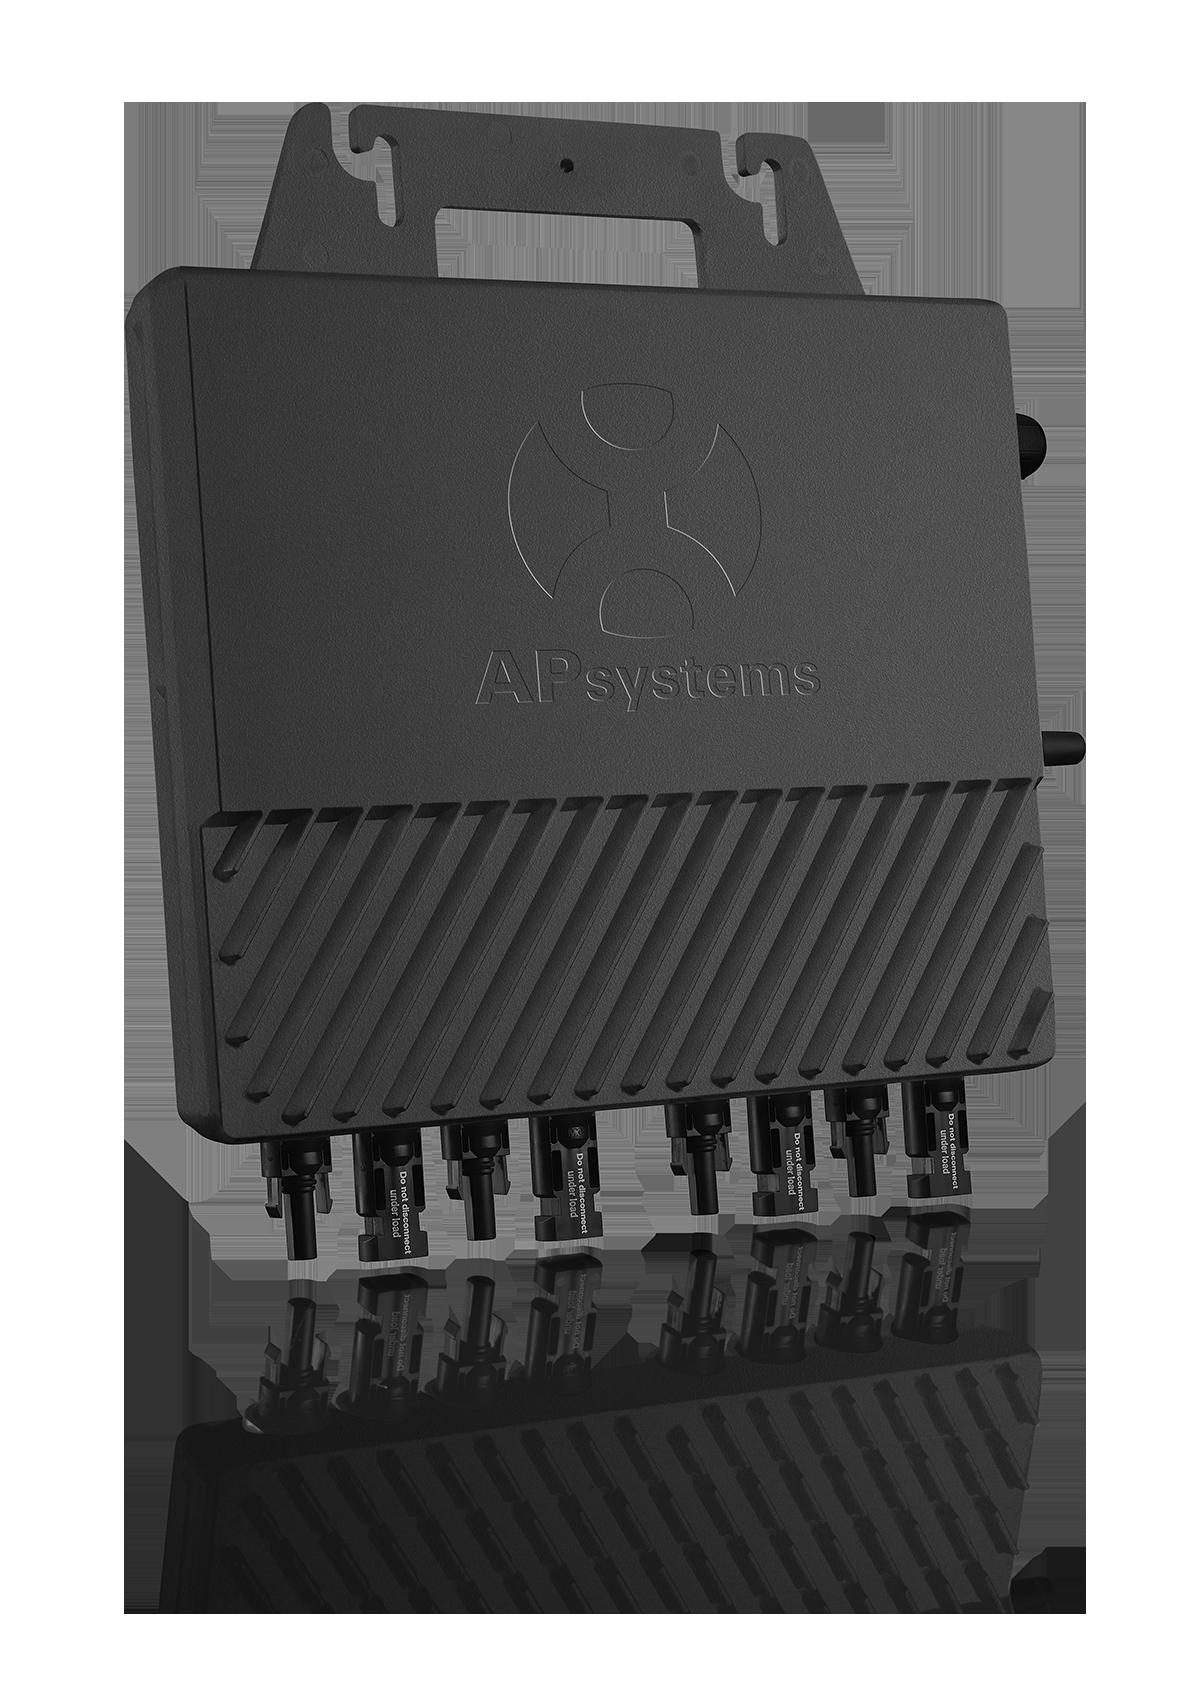 Mikroinwerter APsystems QS1 1200 kW